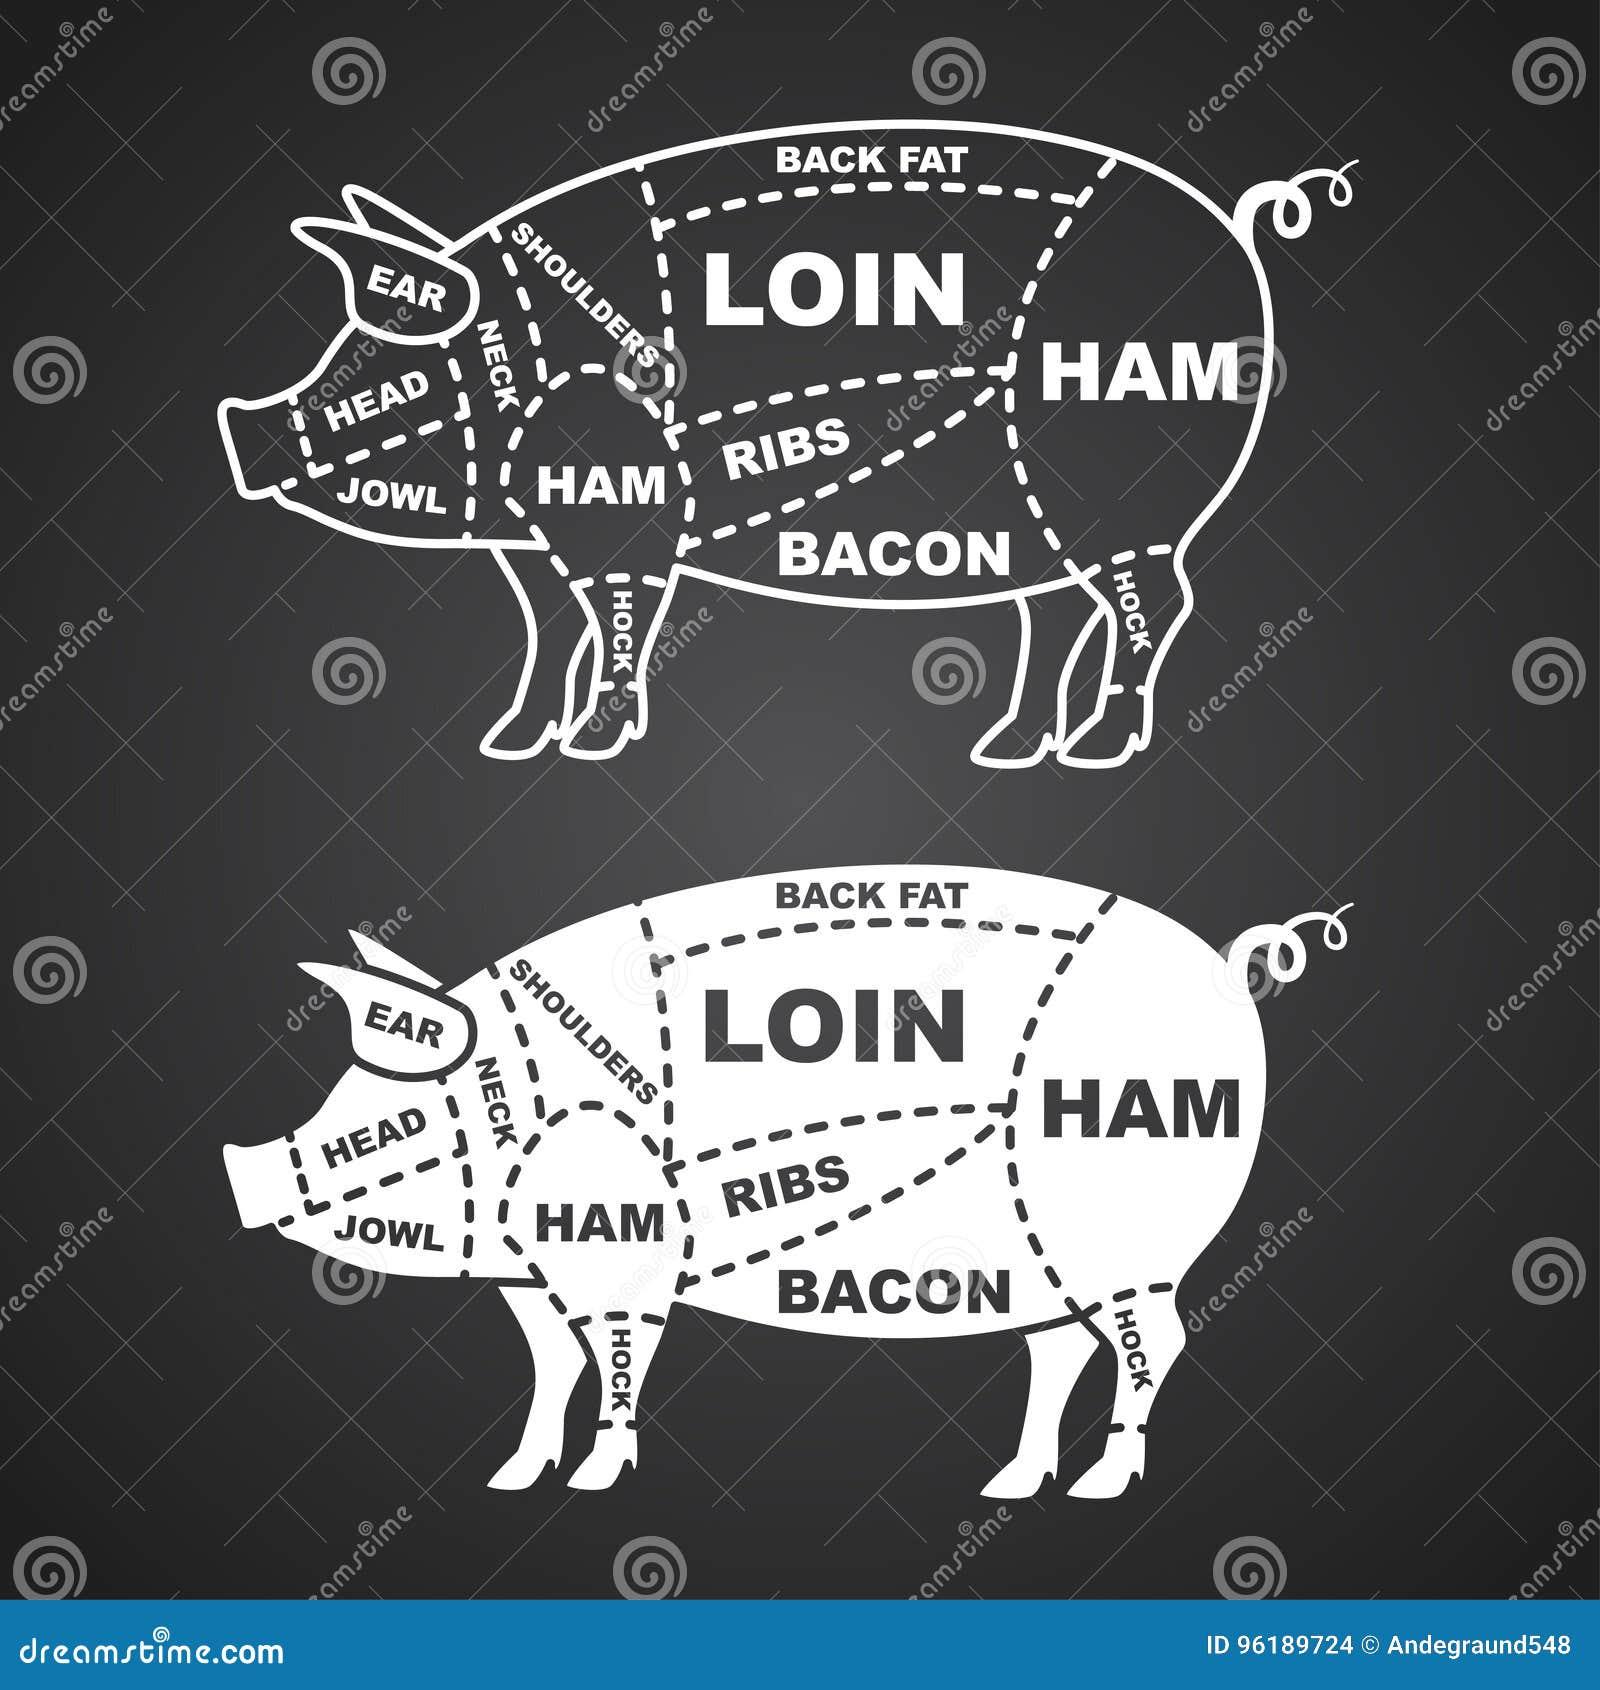 Diagrama dos cortes de carne de porco isolado no vetor preto